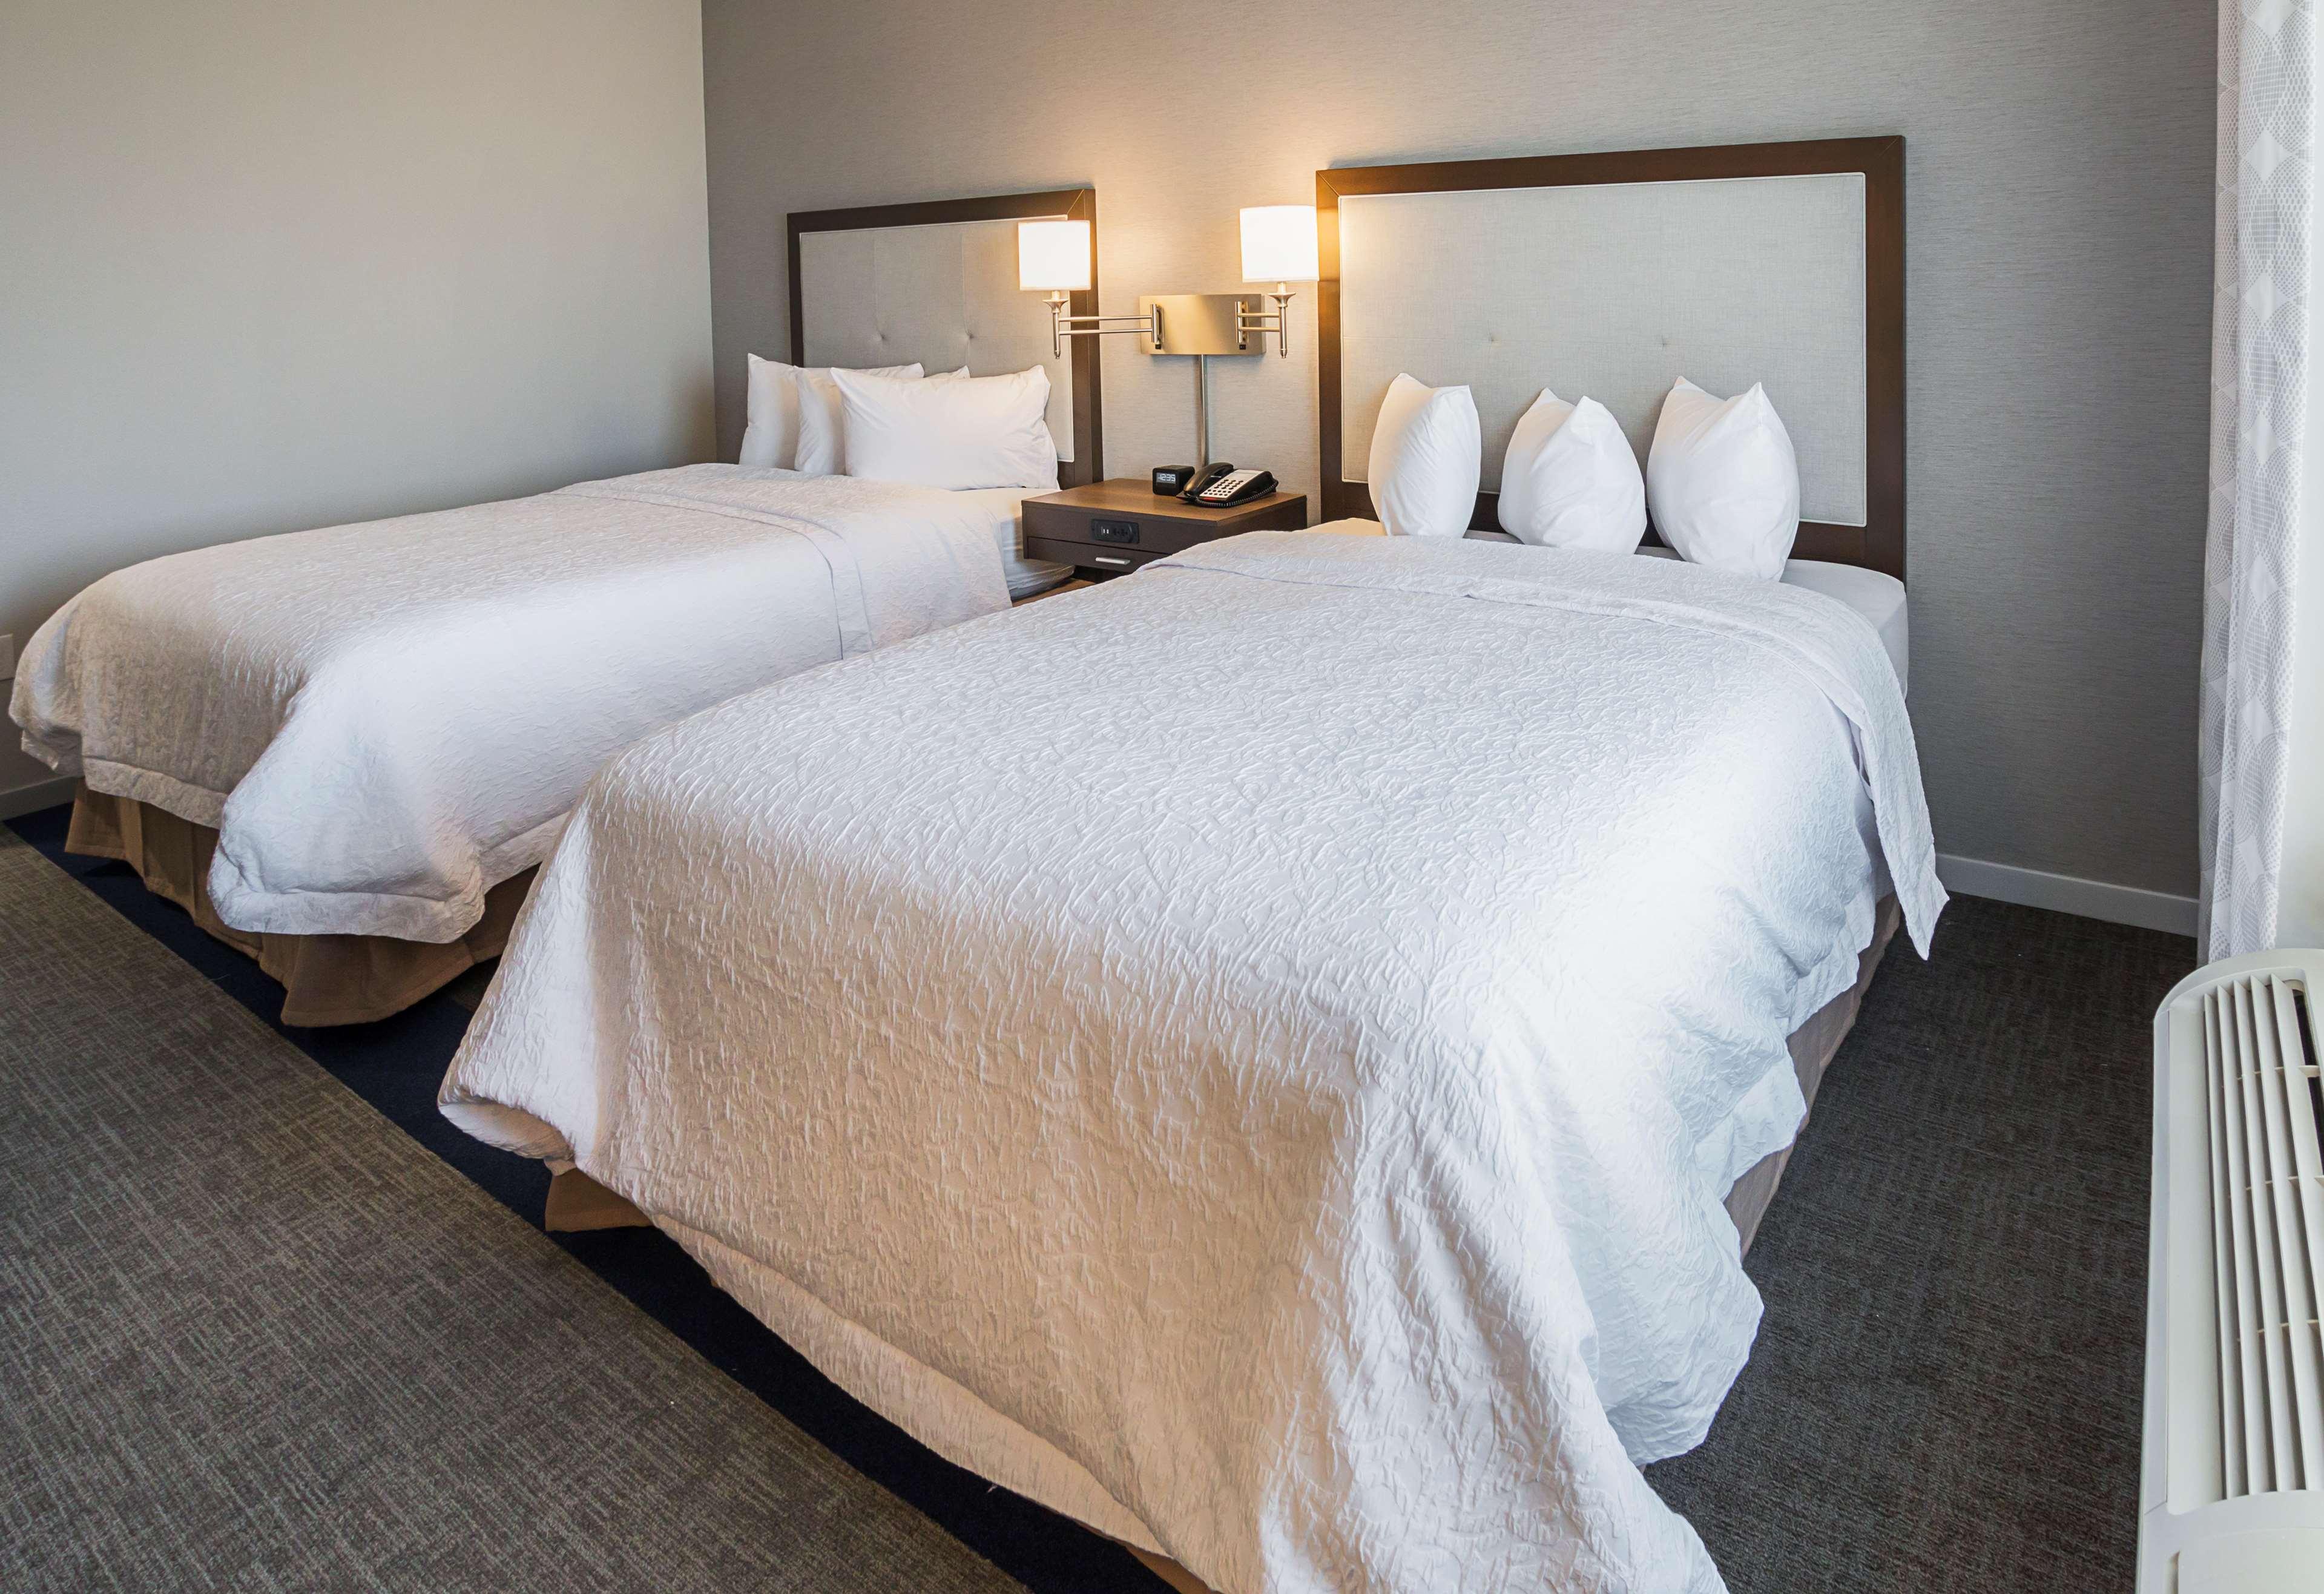 Hampton Inn & Suites Colleyville DFW West image 37